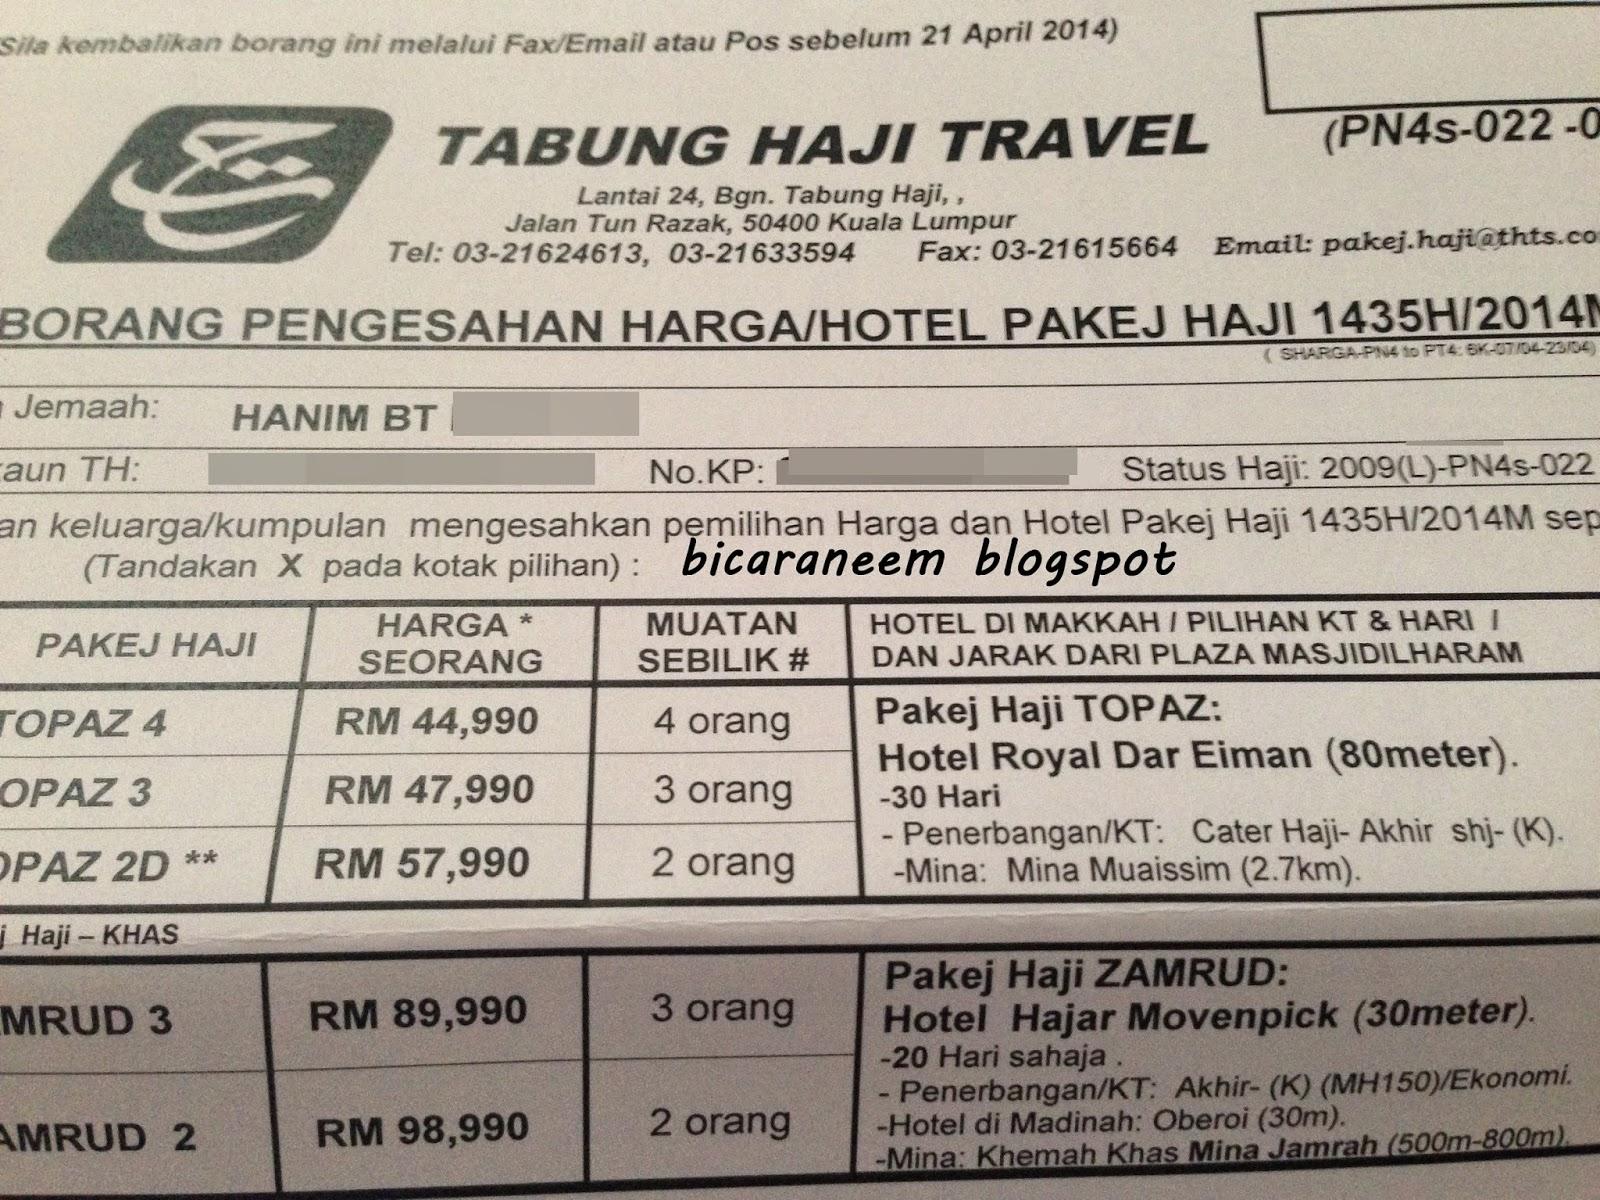 Harga Pakej Haji Tabung Haji Travel 1435H/2014M terkini